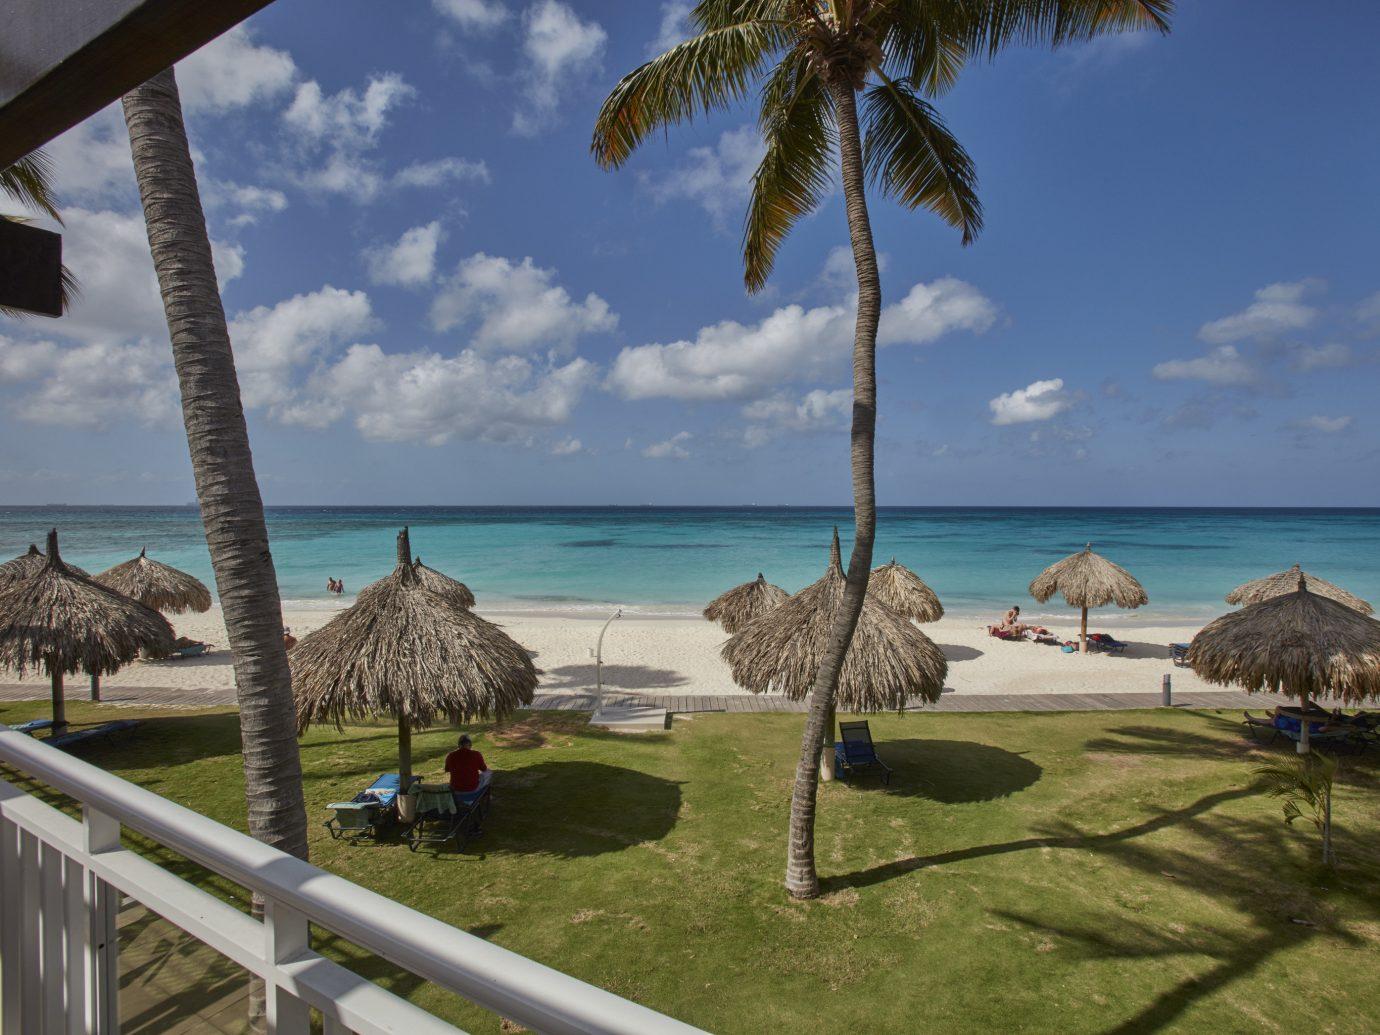 Hotels sky outdoor grass tree leisure vacation Beach Ocean Sea caribbean estate arecales Resort tourism Coast bay tropics Villa plant palm shore shade